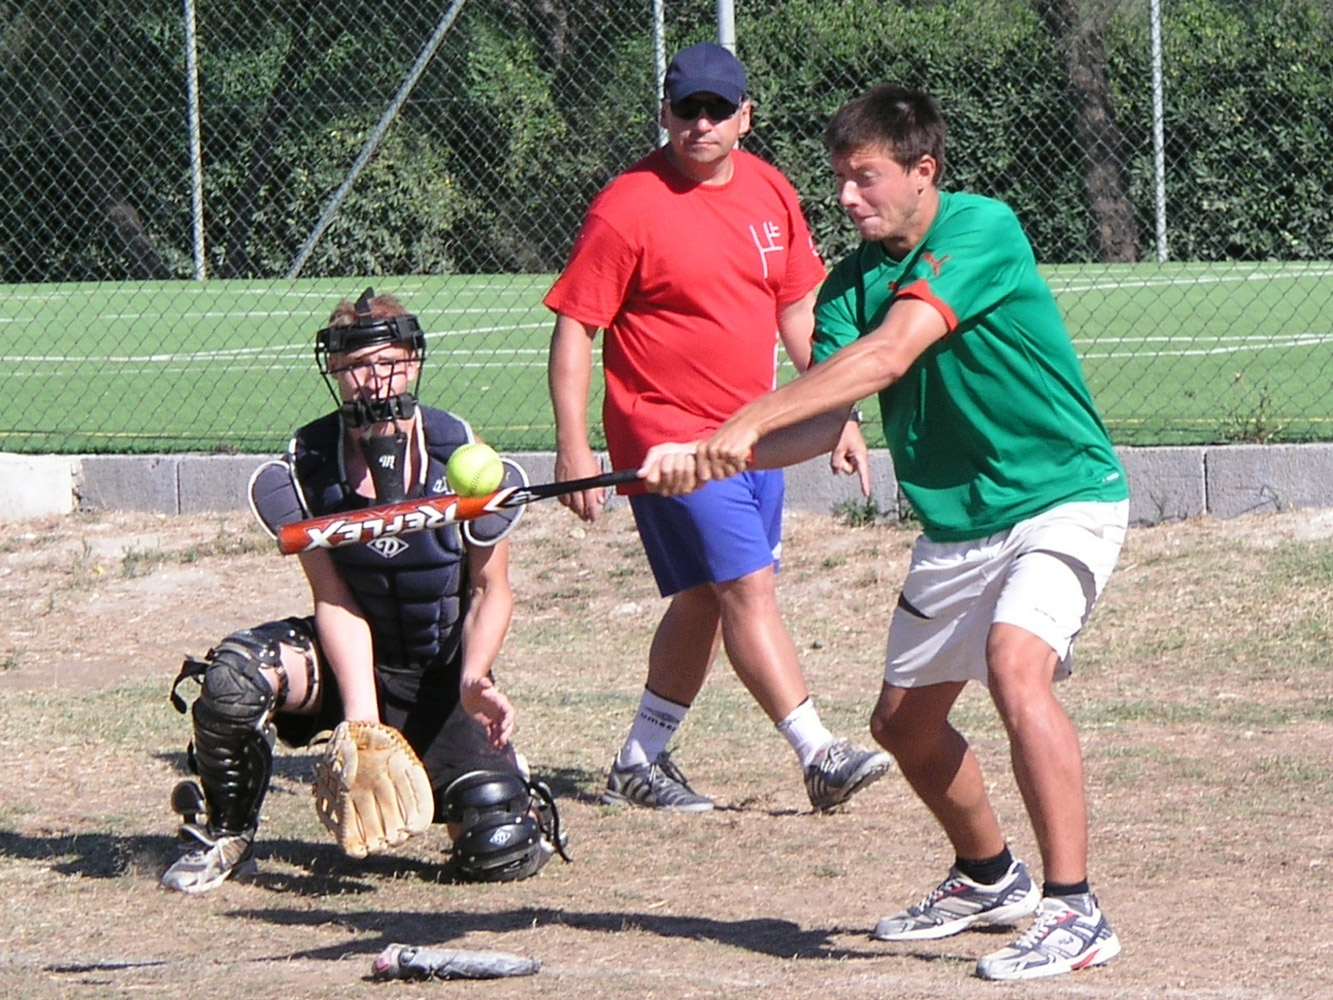 Letní sportovní kurzy v zahraničí – Itálie (Tarquinie)